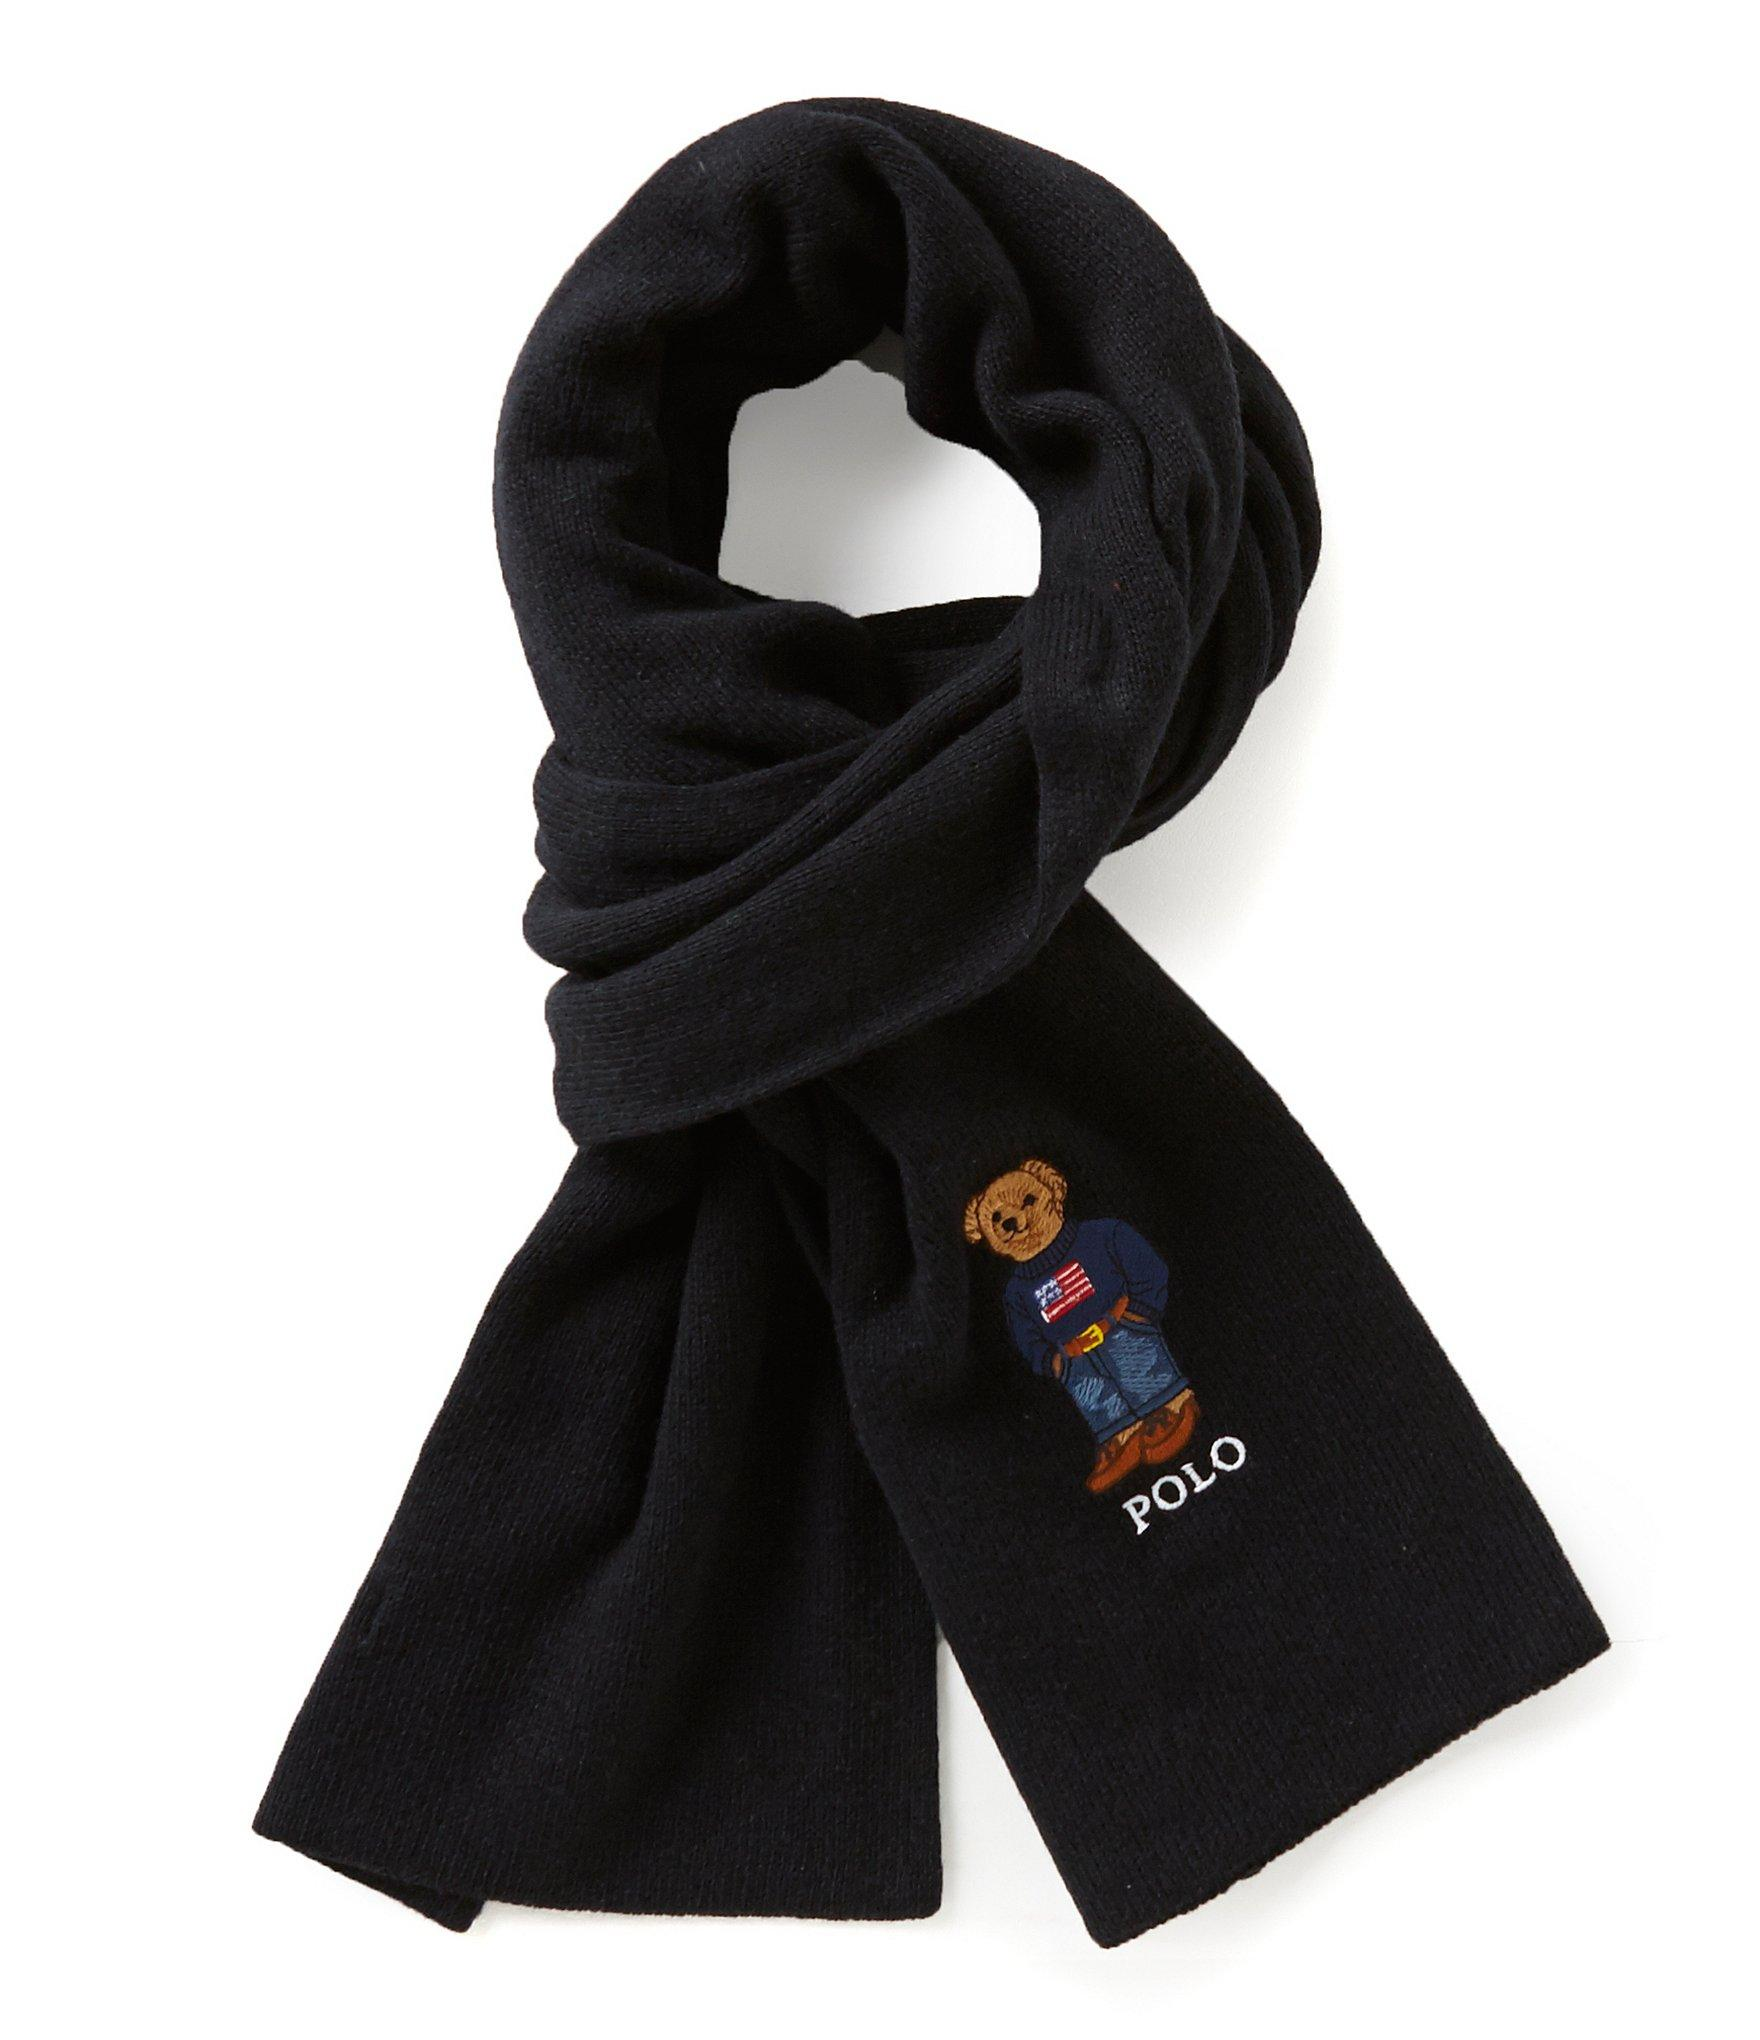 30d94b7b7f931 ... real lyst polo ralph lauren polo bear cardigan ribbed scarf in black  65591 12c02